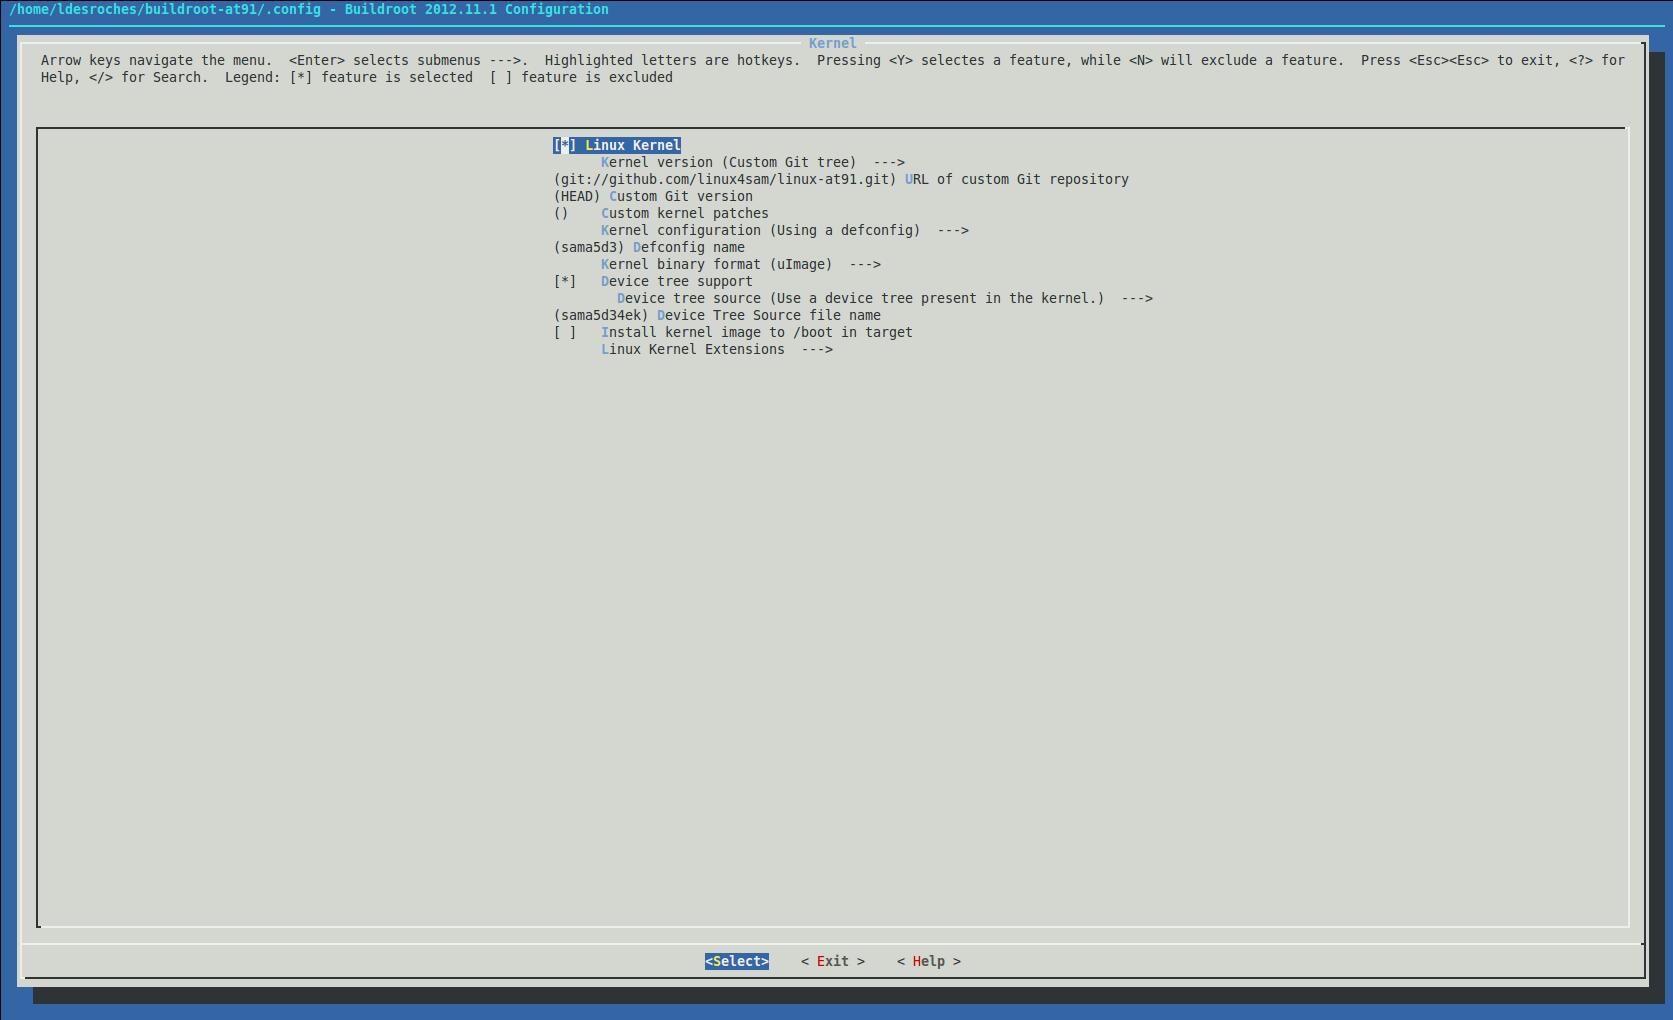 BuildRootBuild < Linux4SAM < TWiki